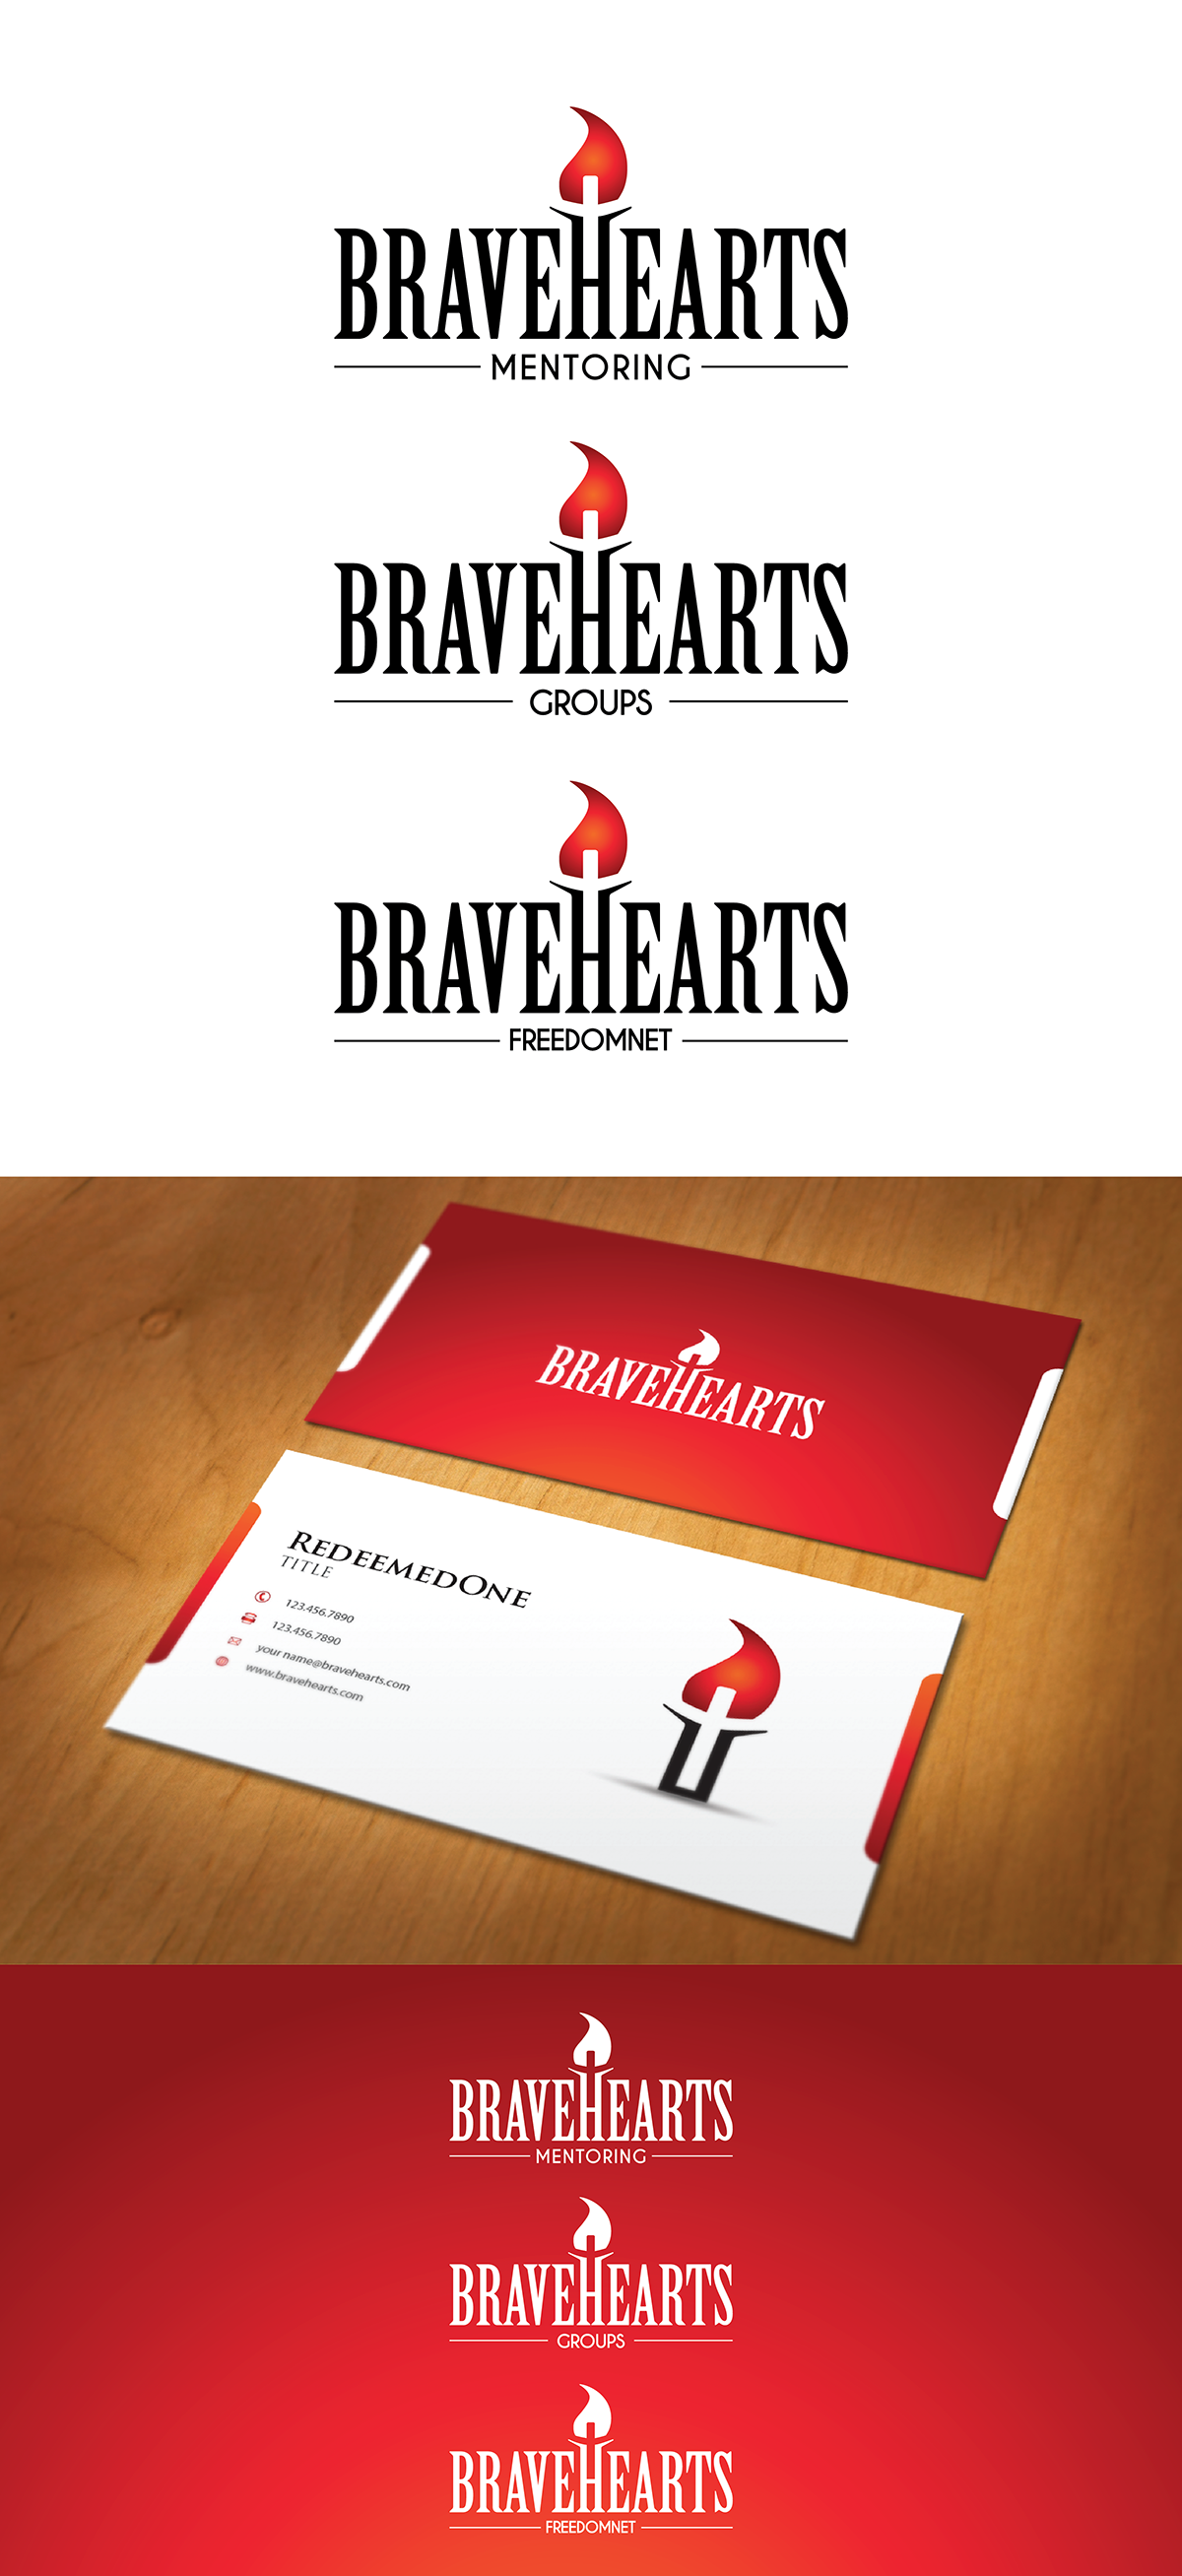 BraveHearts logo redesign